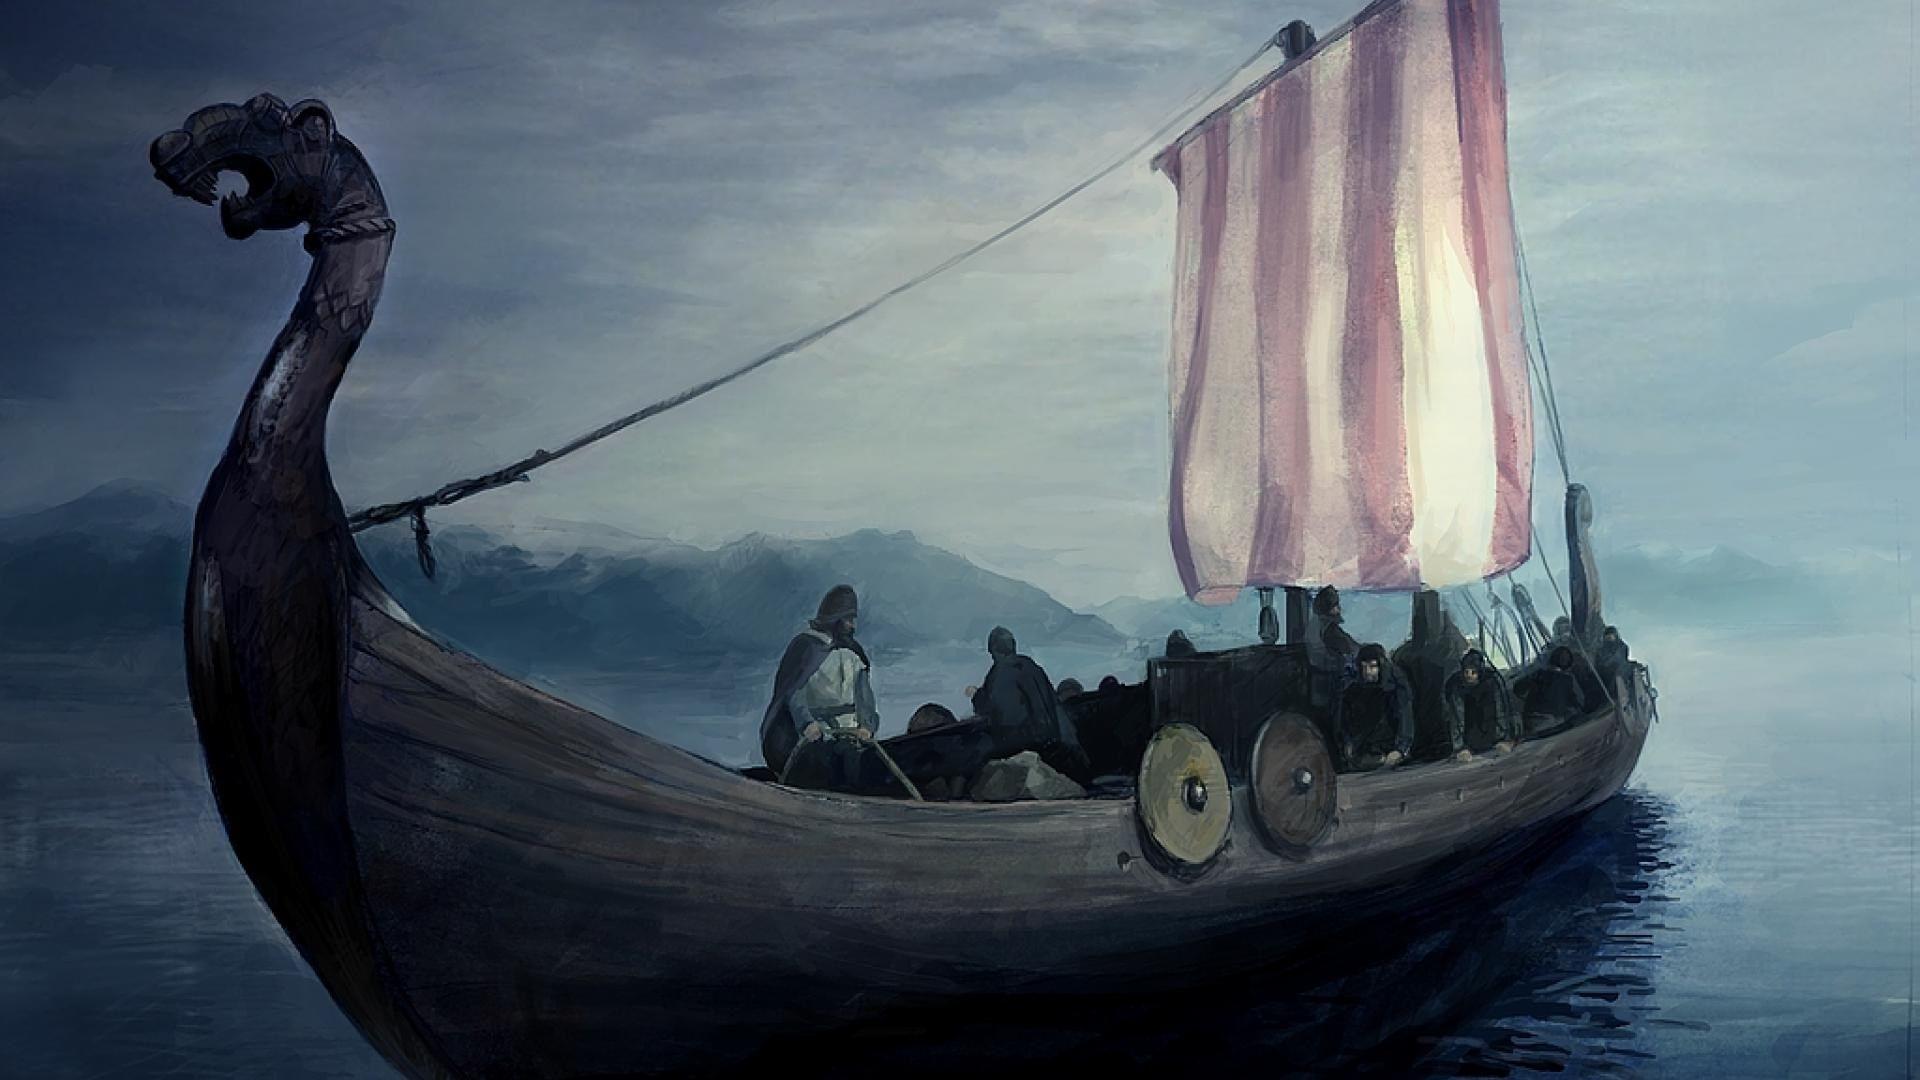 Vikings Wallpaper Hd Pack By Sawyer Walter 2016 06 09 Ololoshka